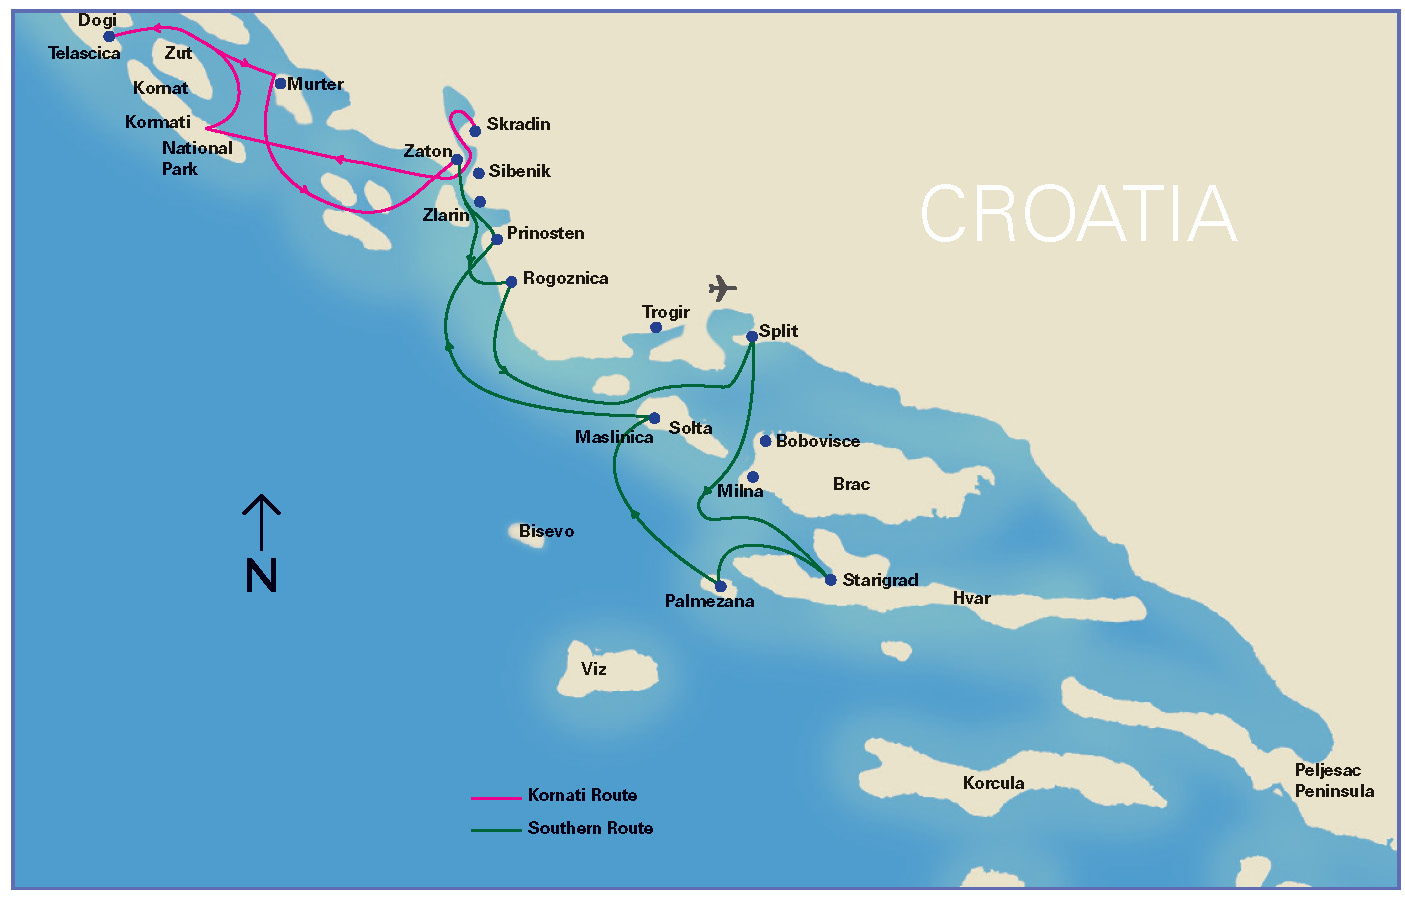 Croatia_Flotilla_Suscape